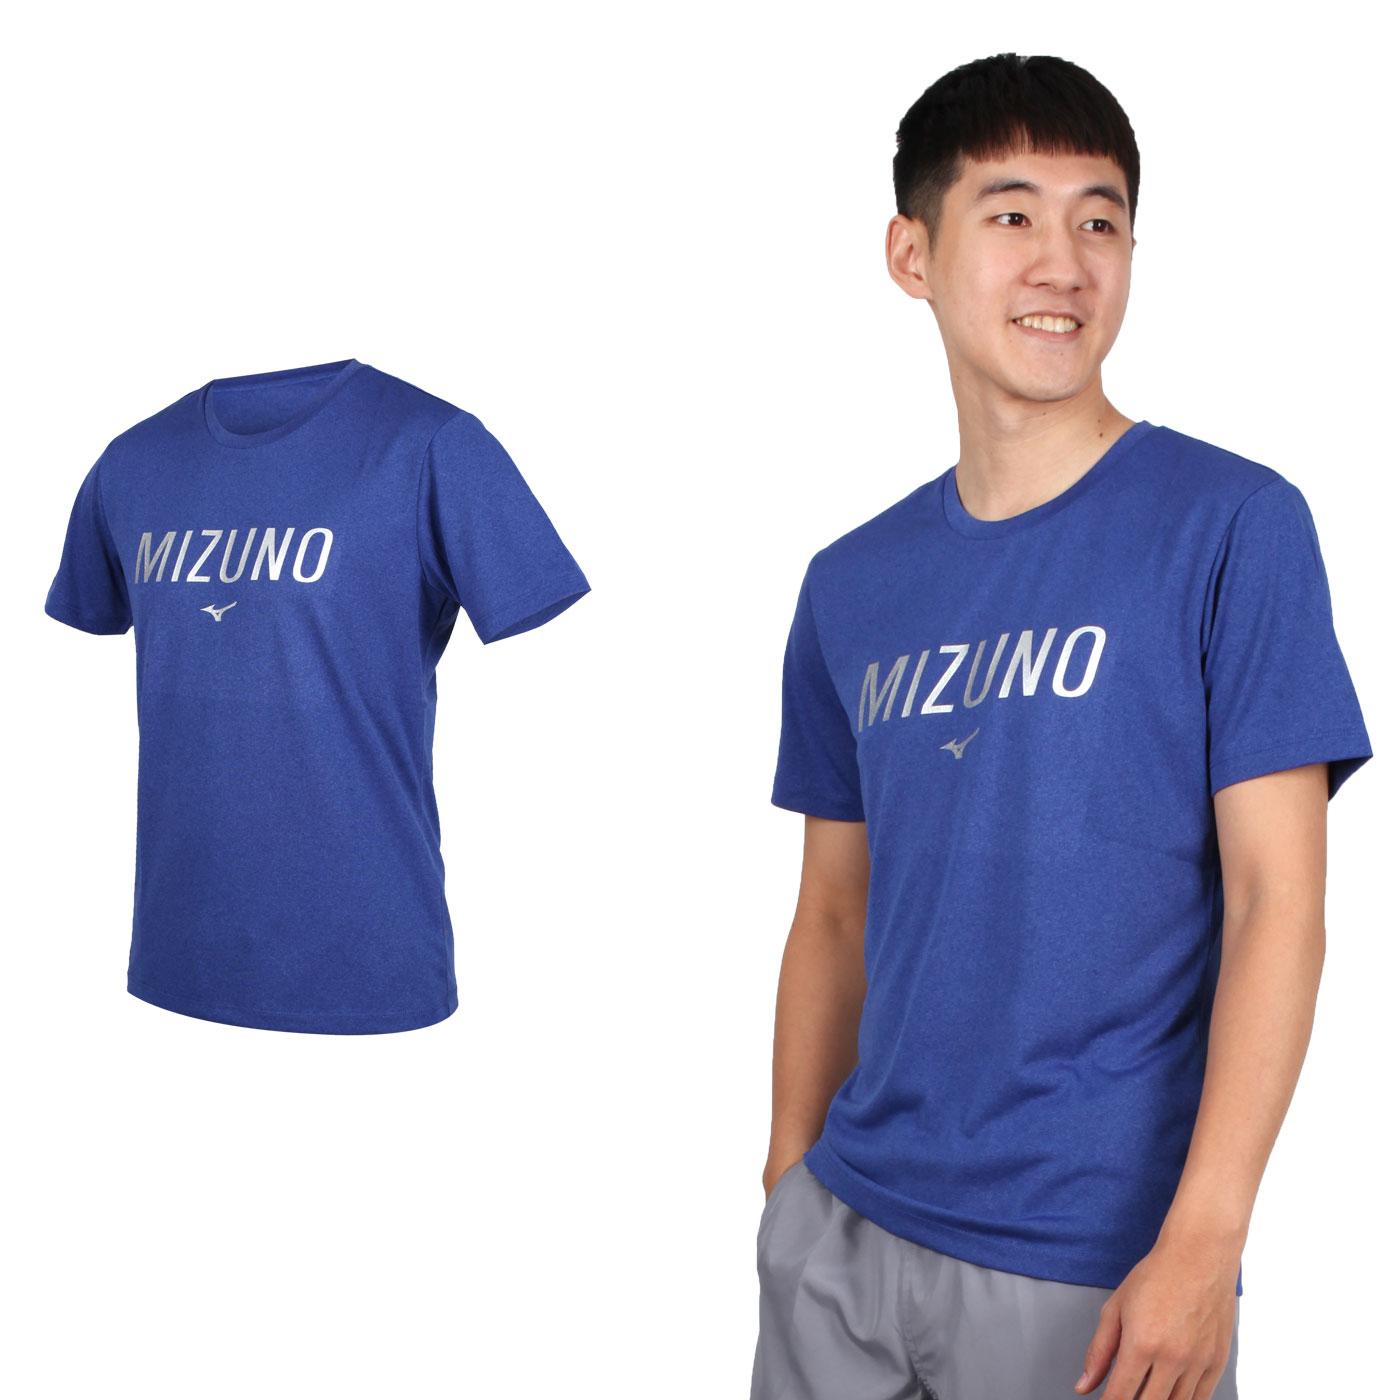 MIZUNO 男款短袖T恤 32TA001116 - 藍銀